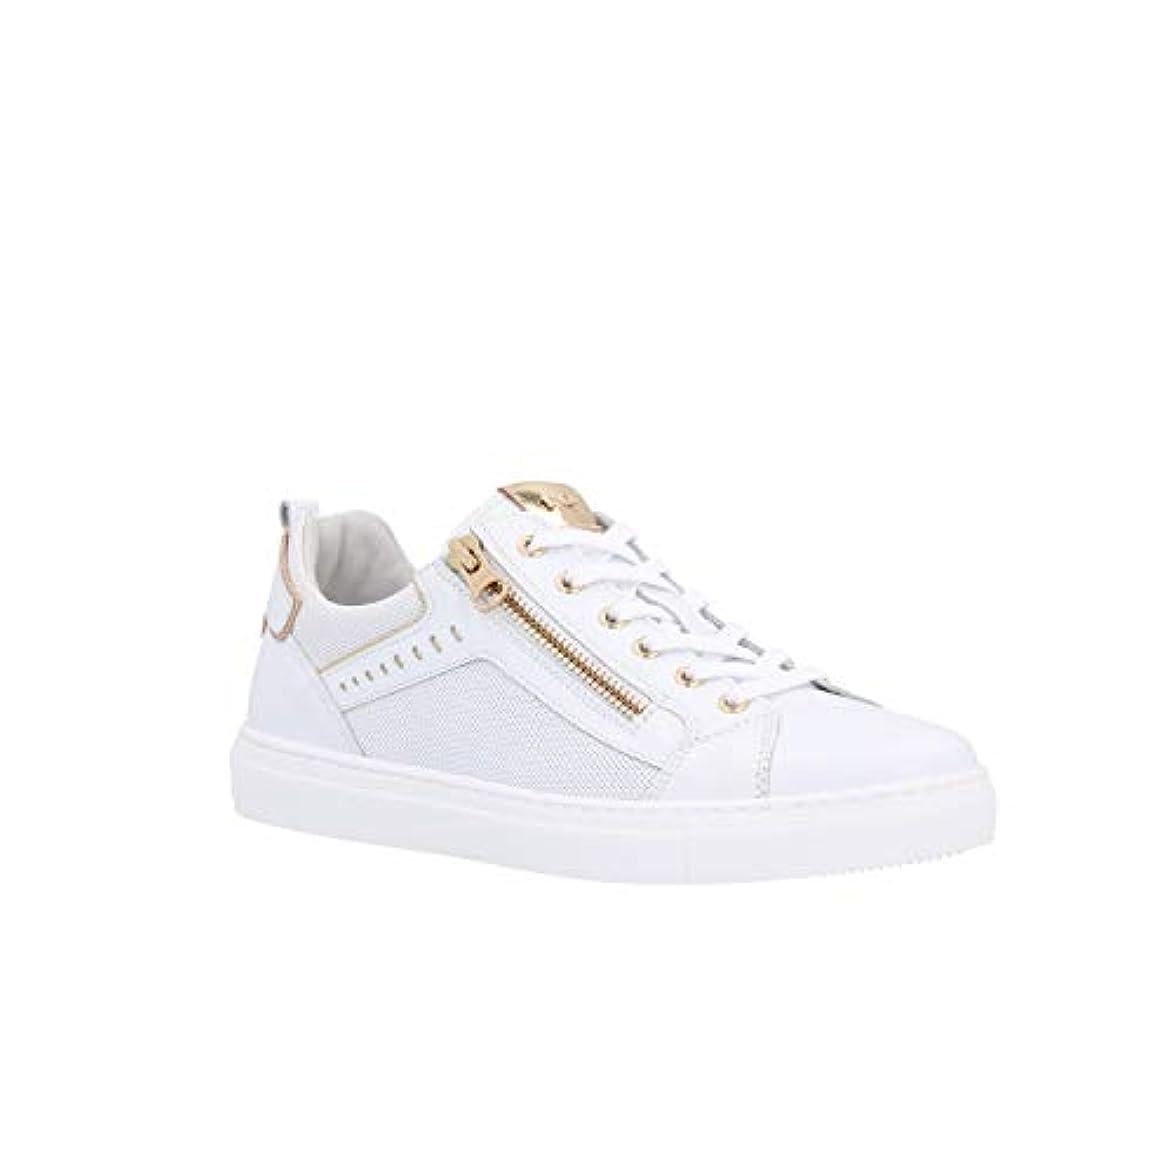 Nero Giardini Sneakers Bianco Scarp Donna P907570d